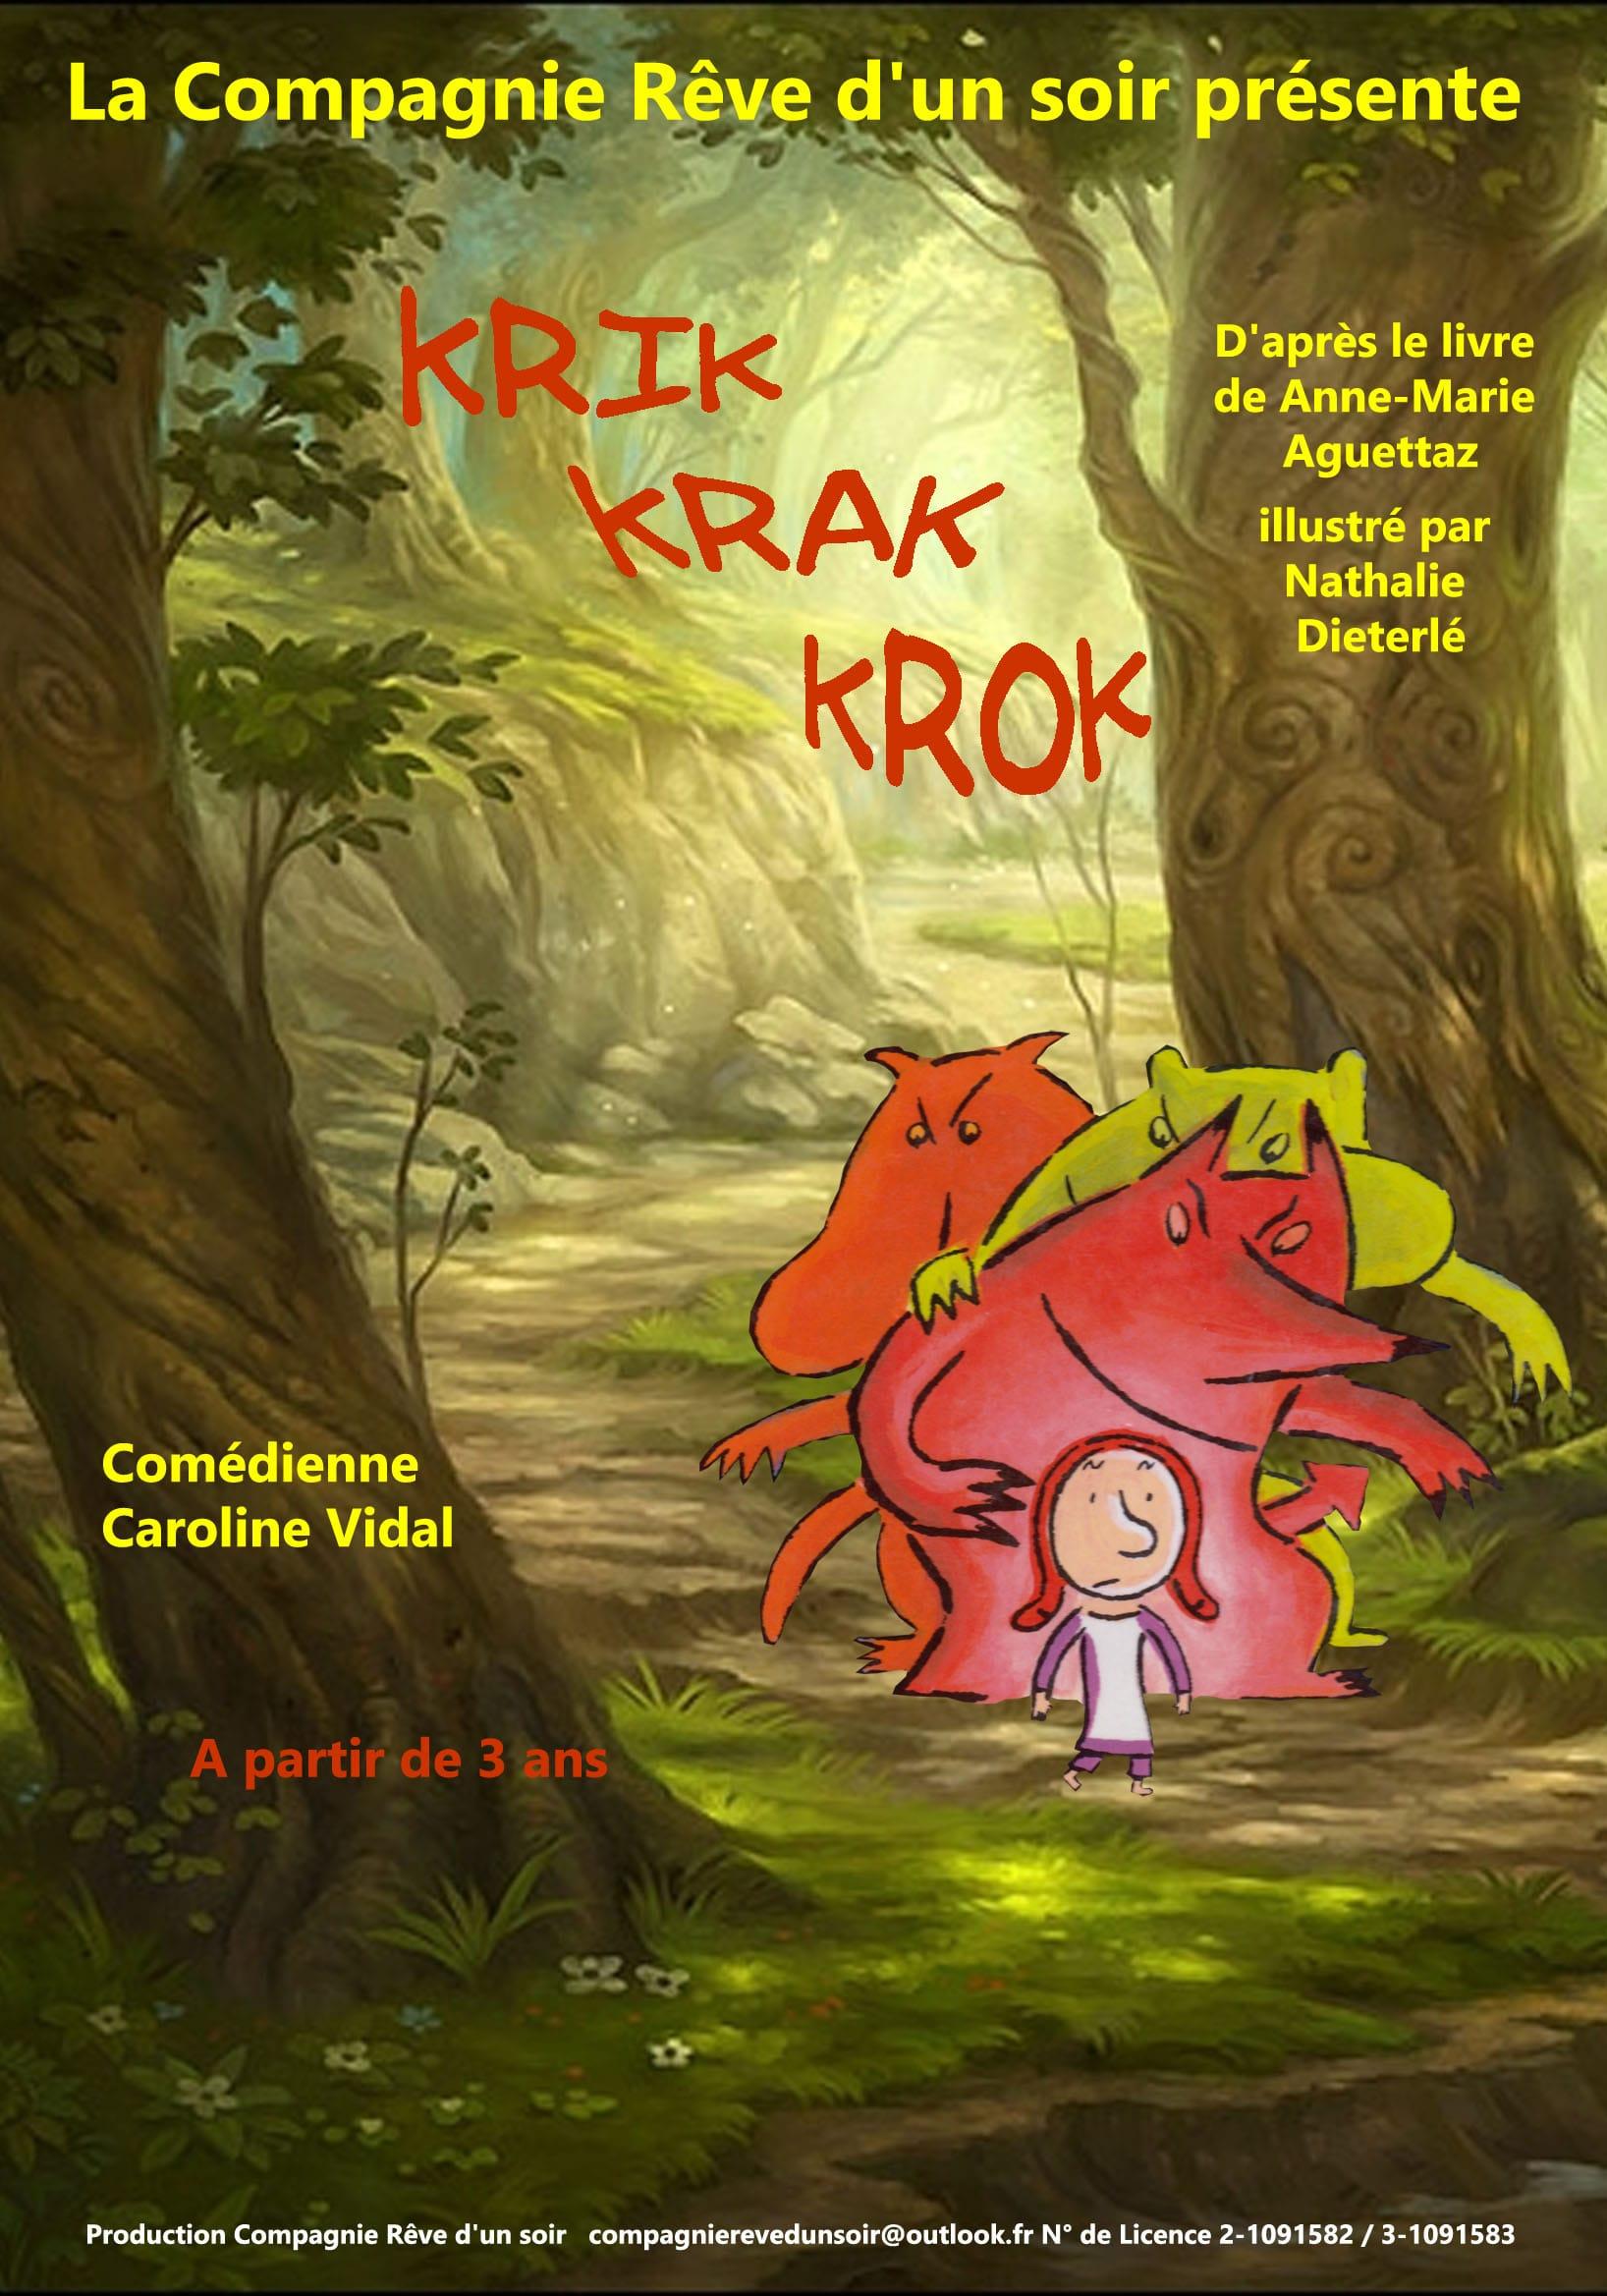 Krik krak krok - théâtre Marseille - 13006 - L'Art Dû - spectacle enfant